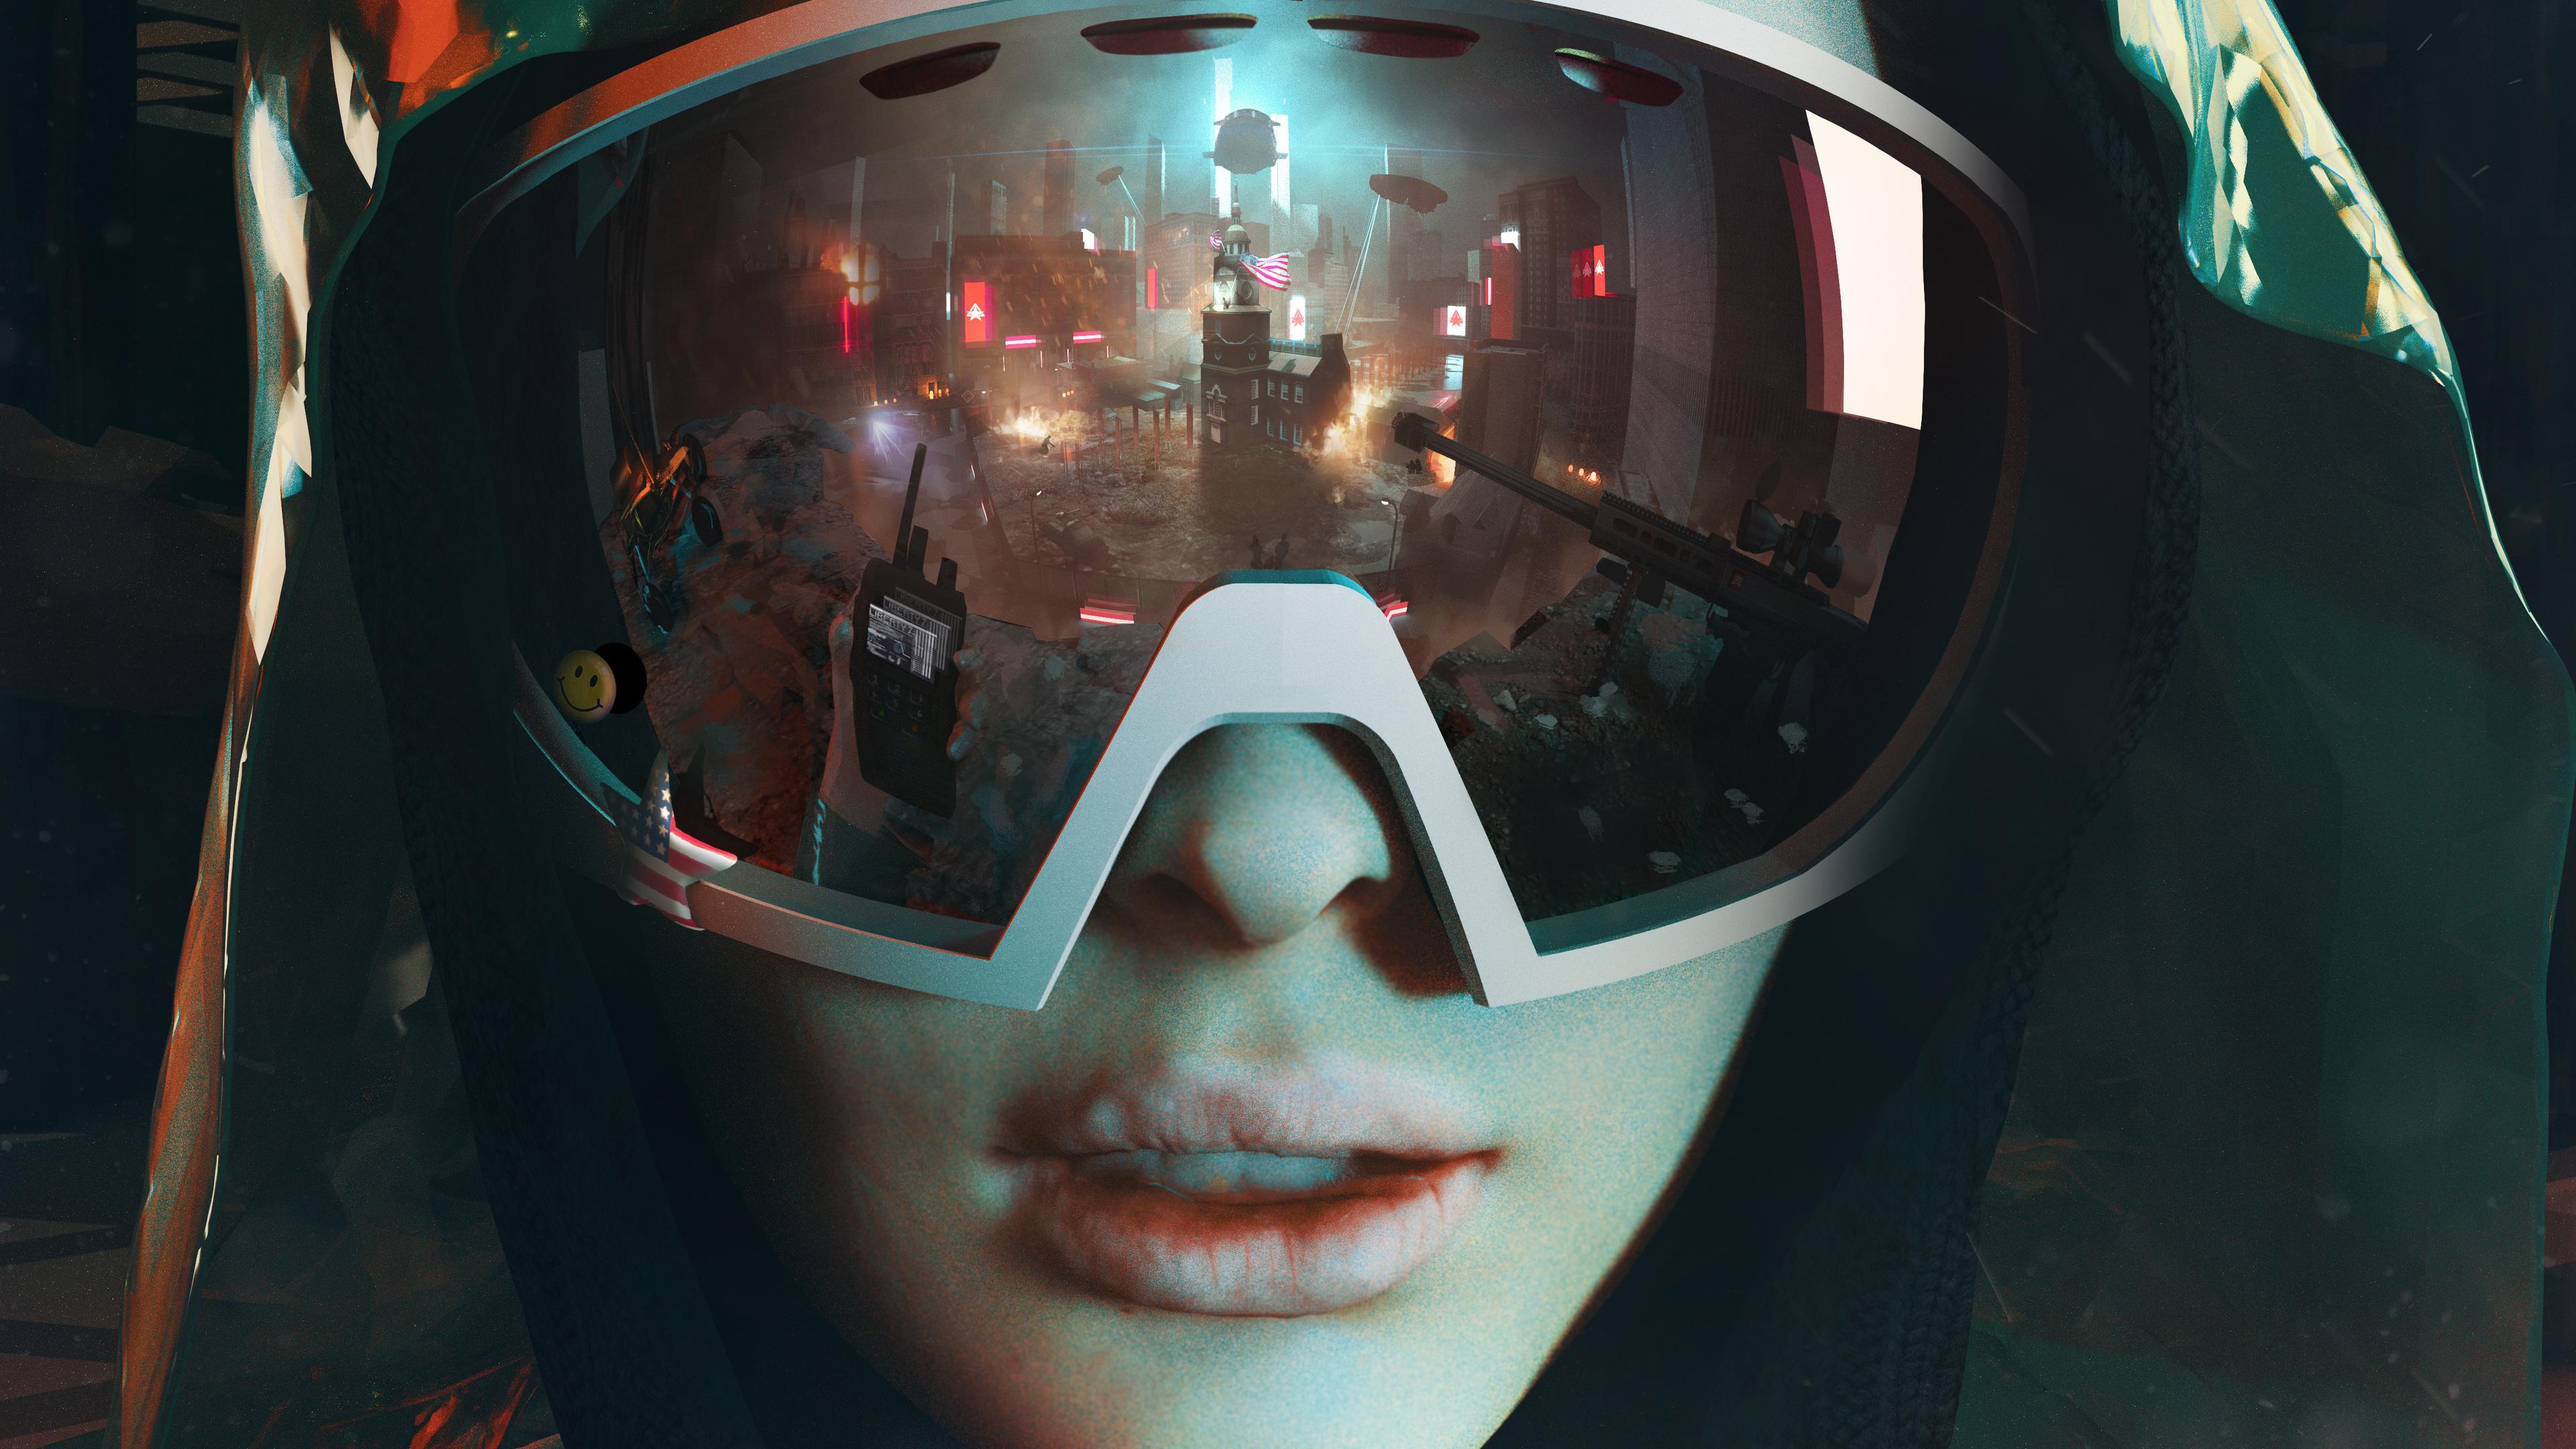 futurist gaming scifi 4k 1540751160 - Futurist Gaming Scifi 4k - scifi wallpapers, hd-wallpapers, gaming wallpapers, future wallpapers, 4k-wallpapers